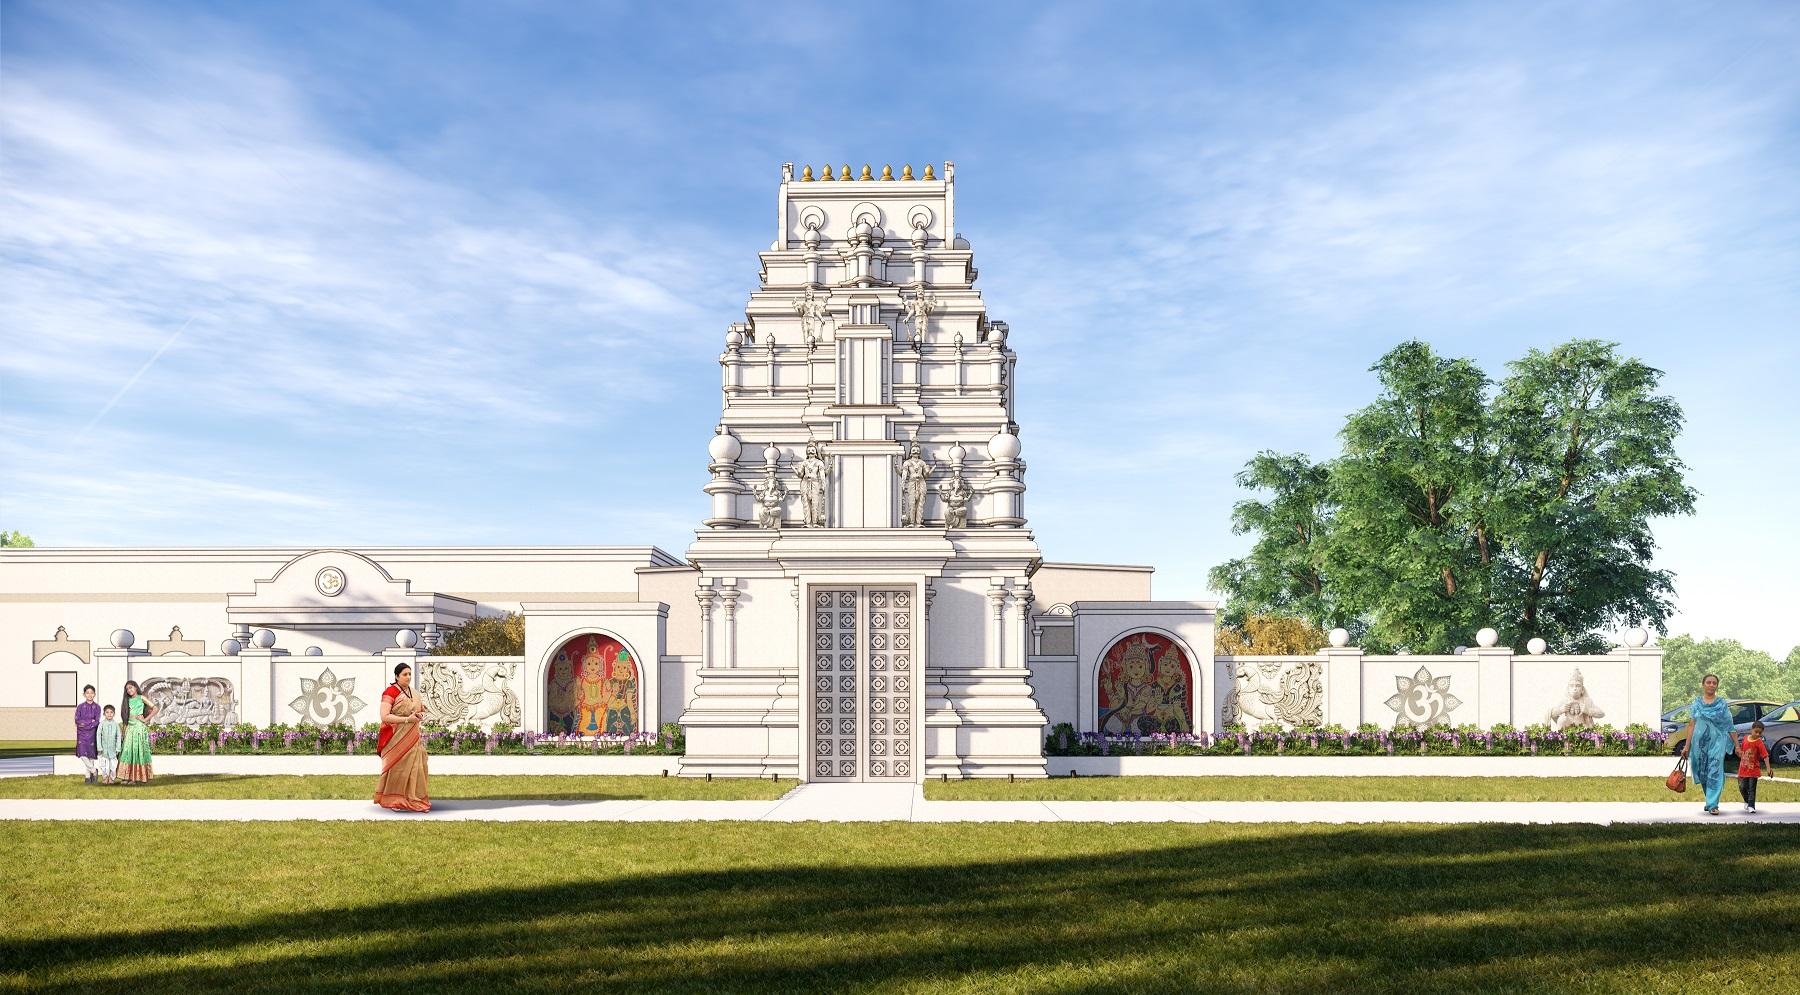 Hindu Temple & Cultural Center of Kansas City